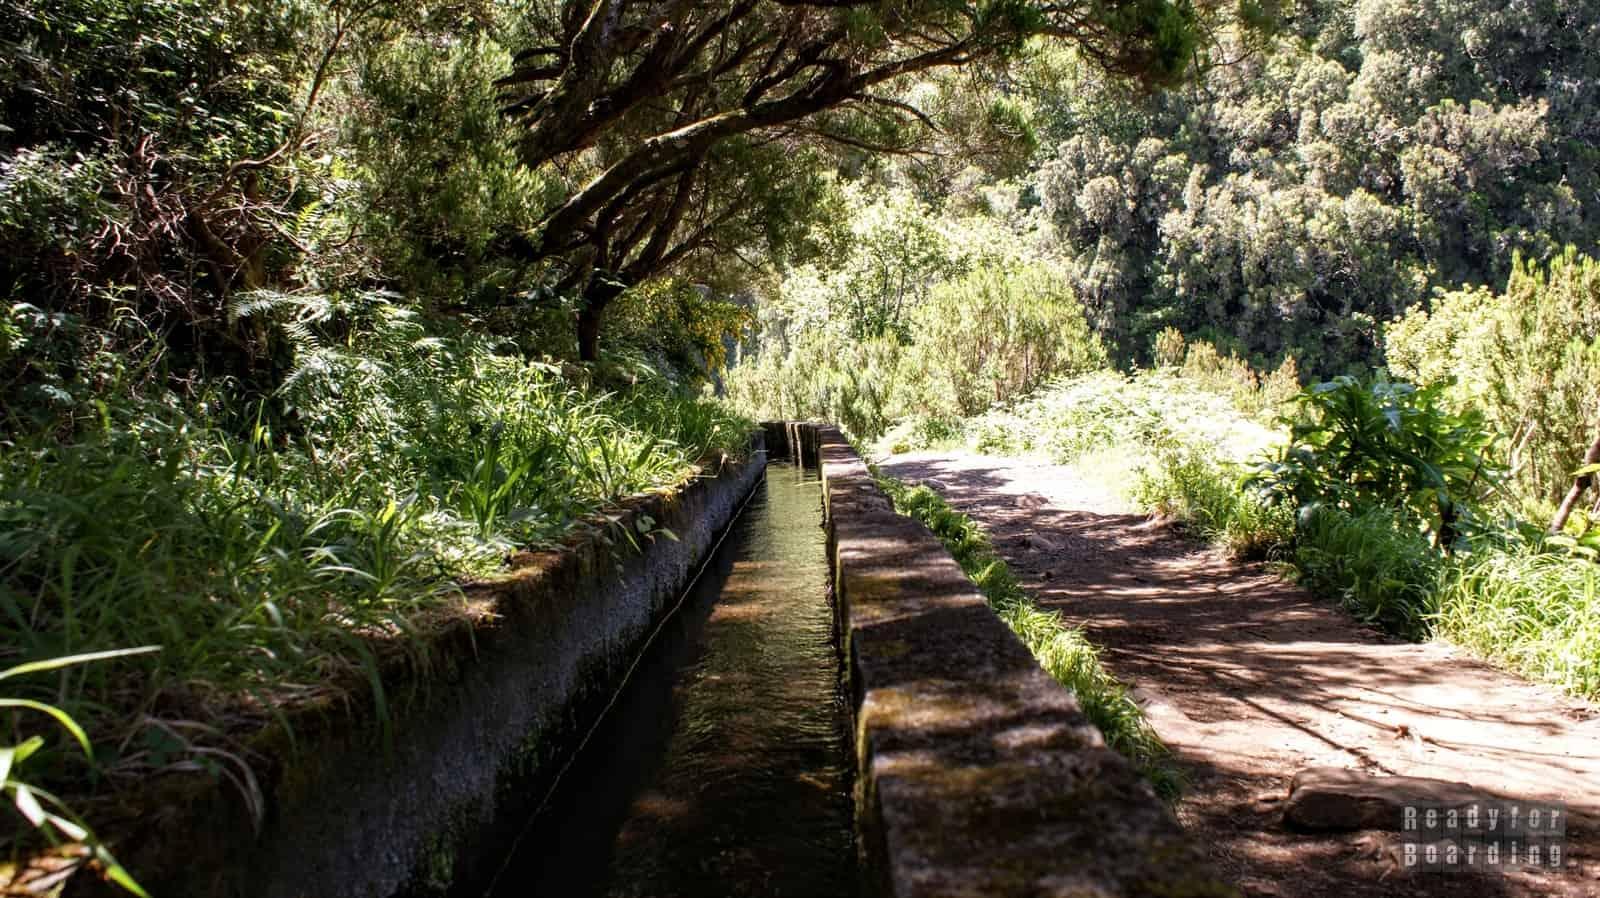 Madera - Lewady (galeria zdjęć)